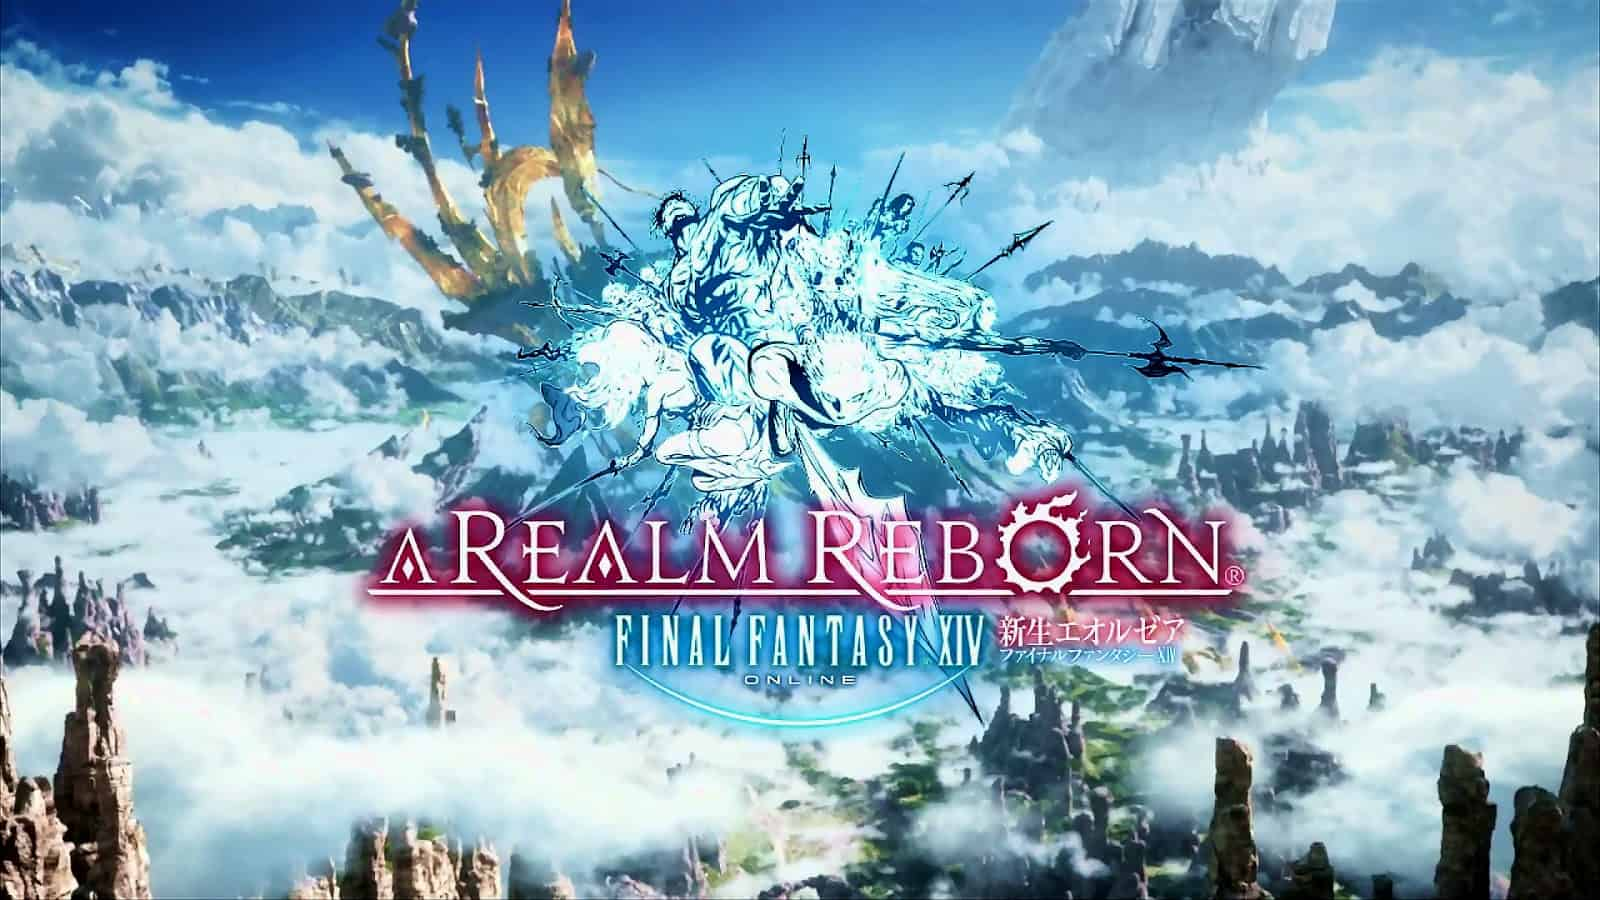 Final fantasy xiv a realm reborn free trial in arrivo sulle console